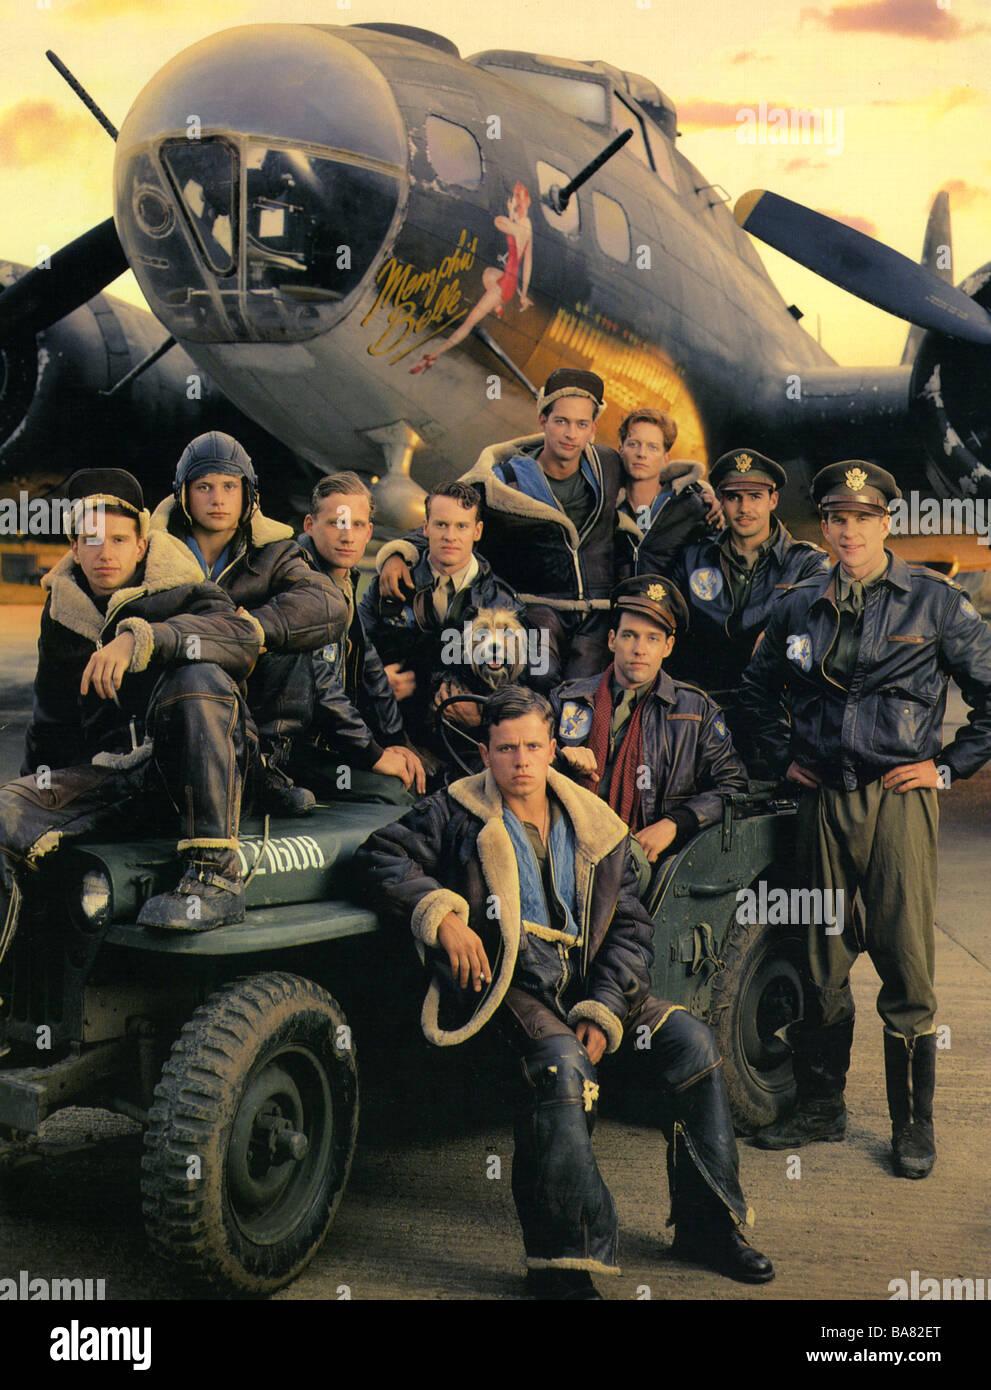 MEMPHIS BELLE 1990 Warner film with Matthew Modine - Stock Image